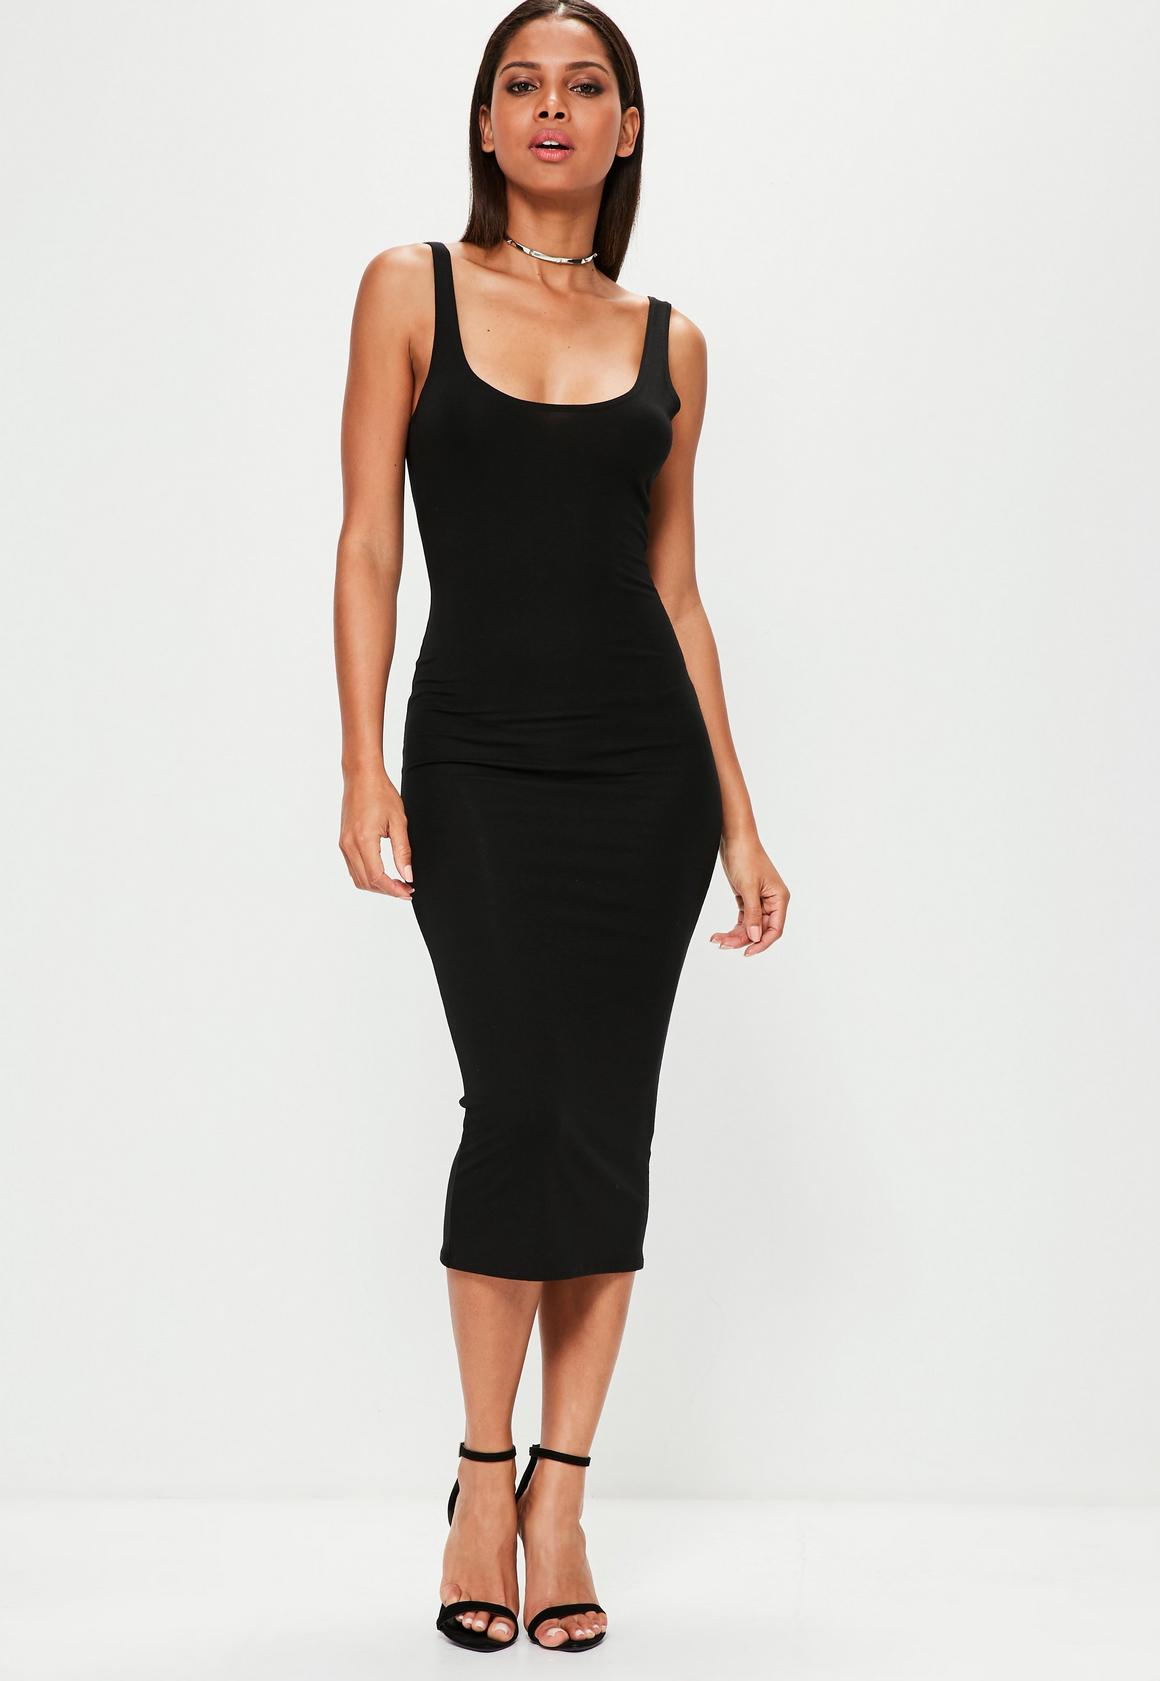 Black Scoop Neck Bodycon Midi Dress | Missguided